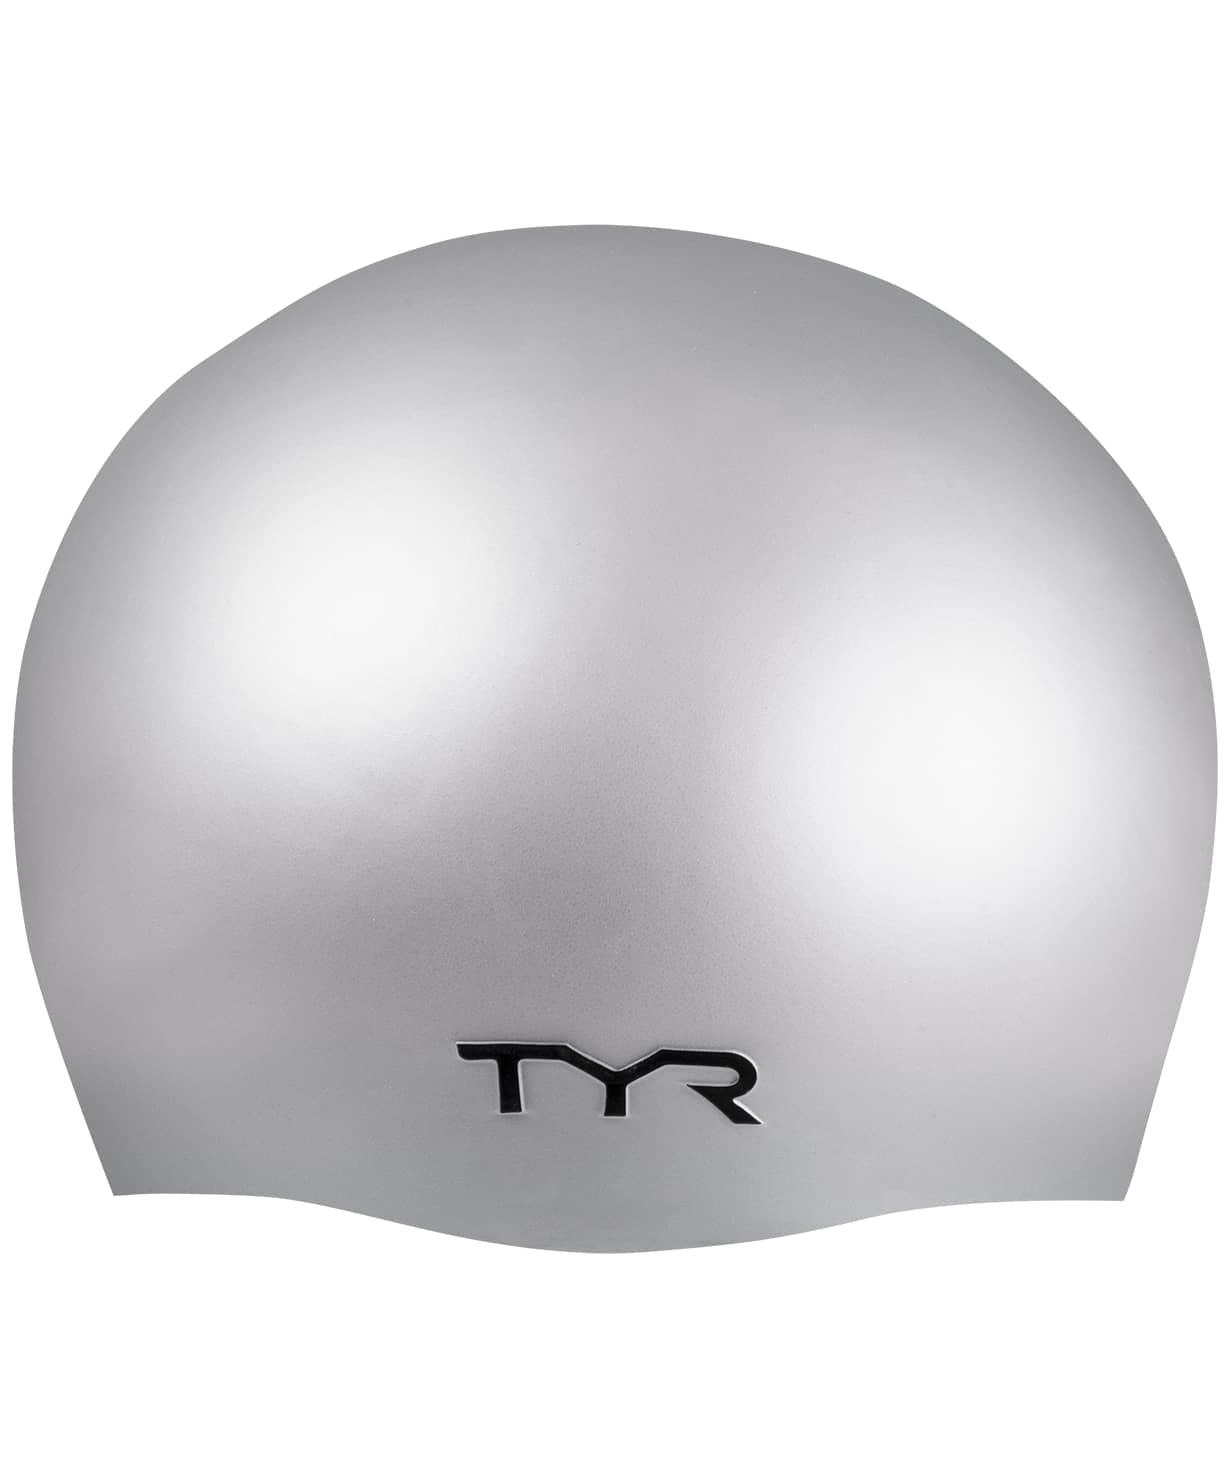 Шапочка для плавания Wrinkle Free Silicone Cap, силикон, LCS/040, серебристый